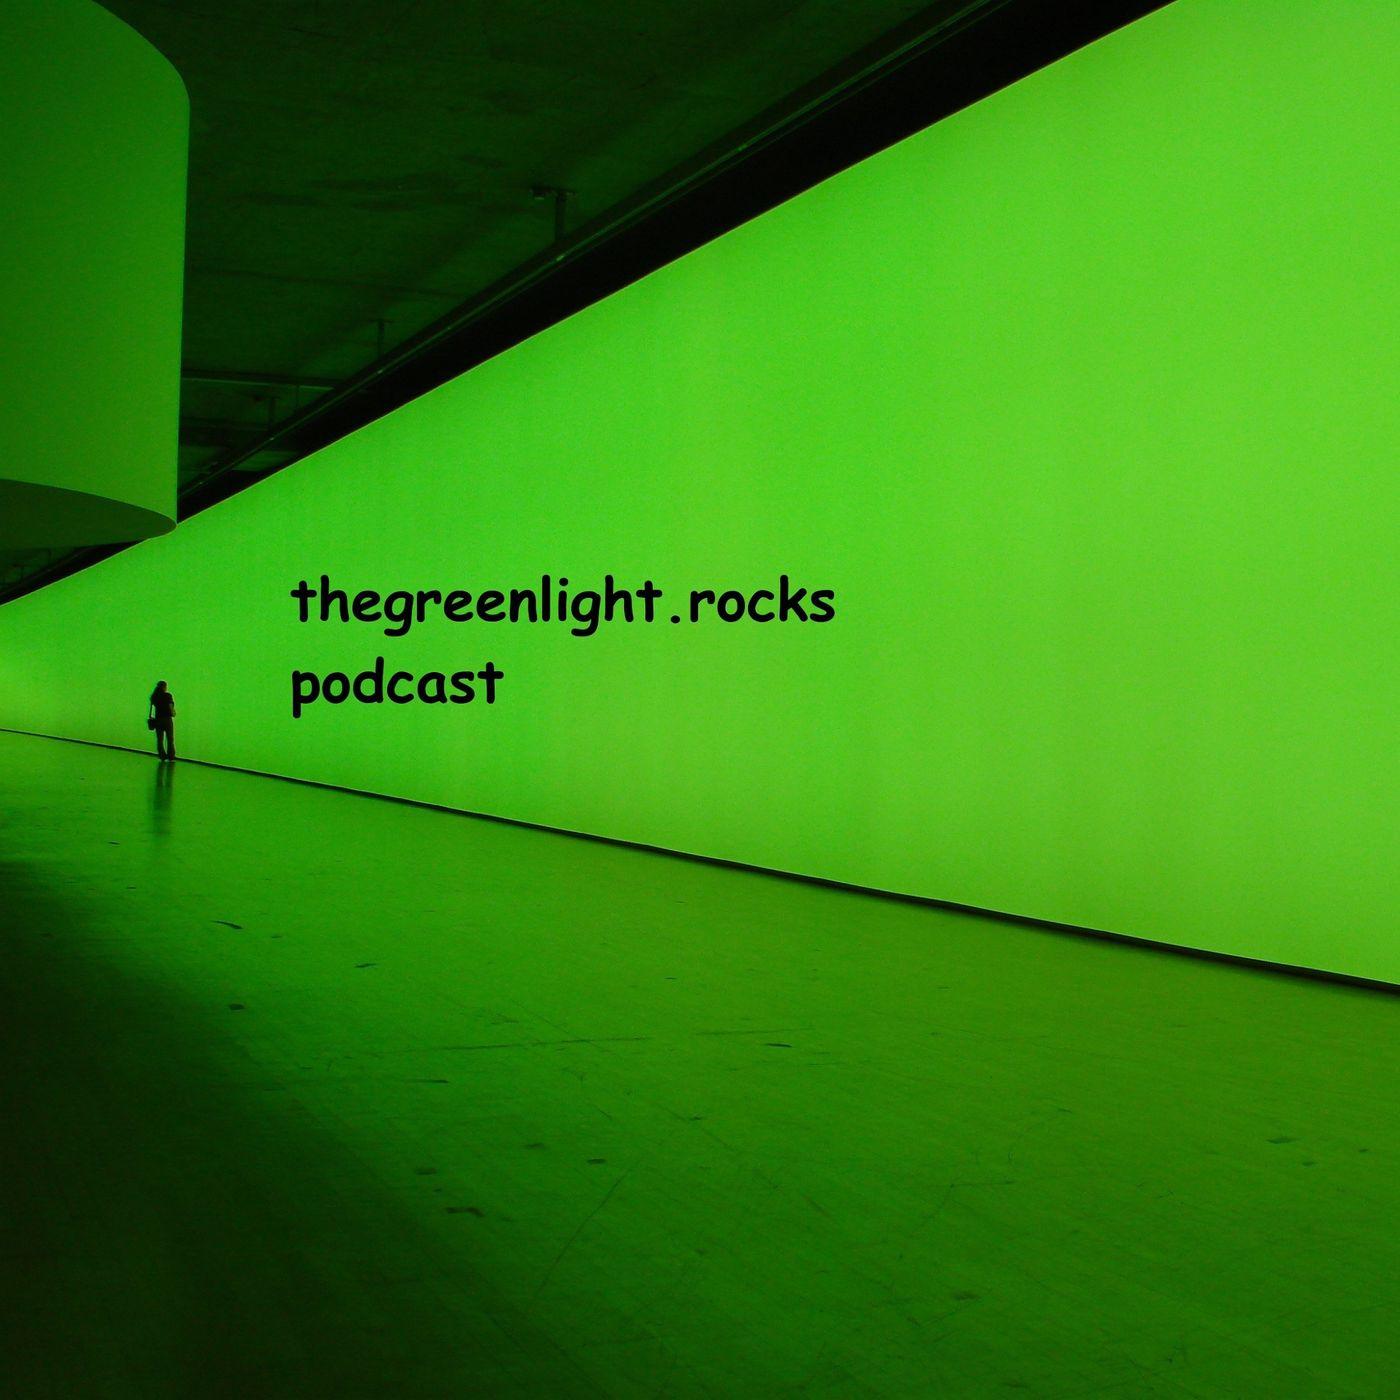 thegreenlight.rocks podcast